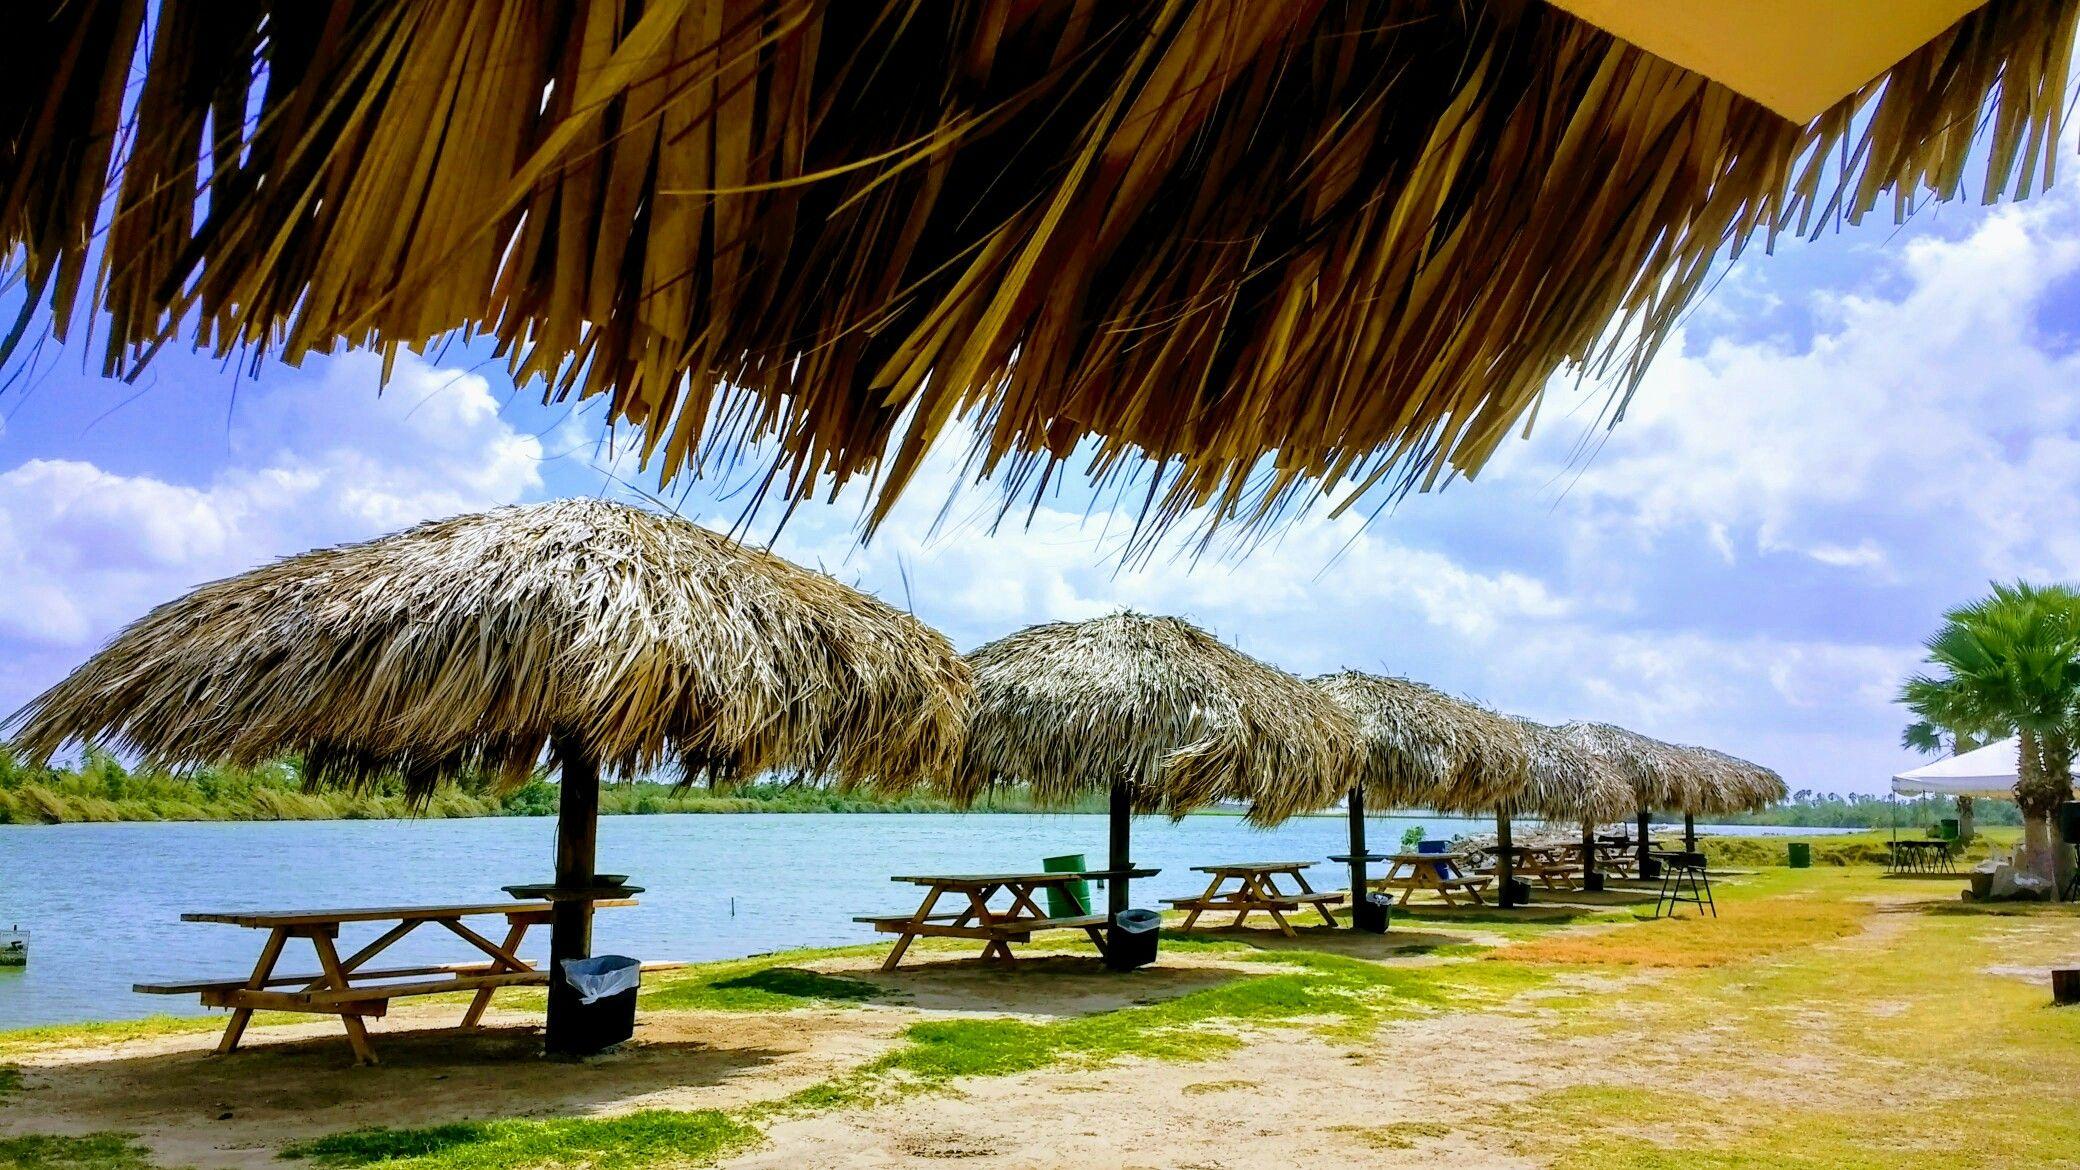 Zoológico de Reynosa, palapas, río bravo, laguna, sol y naturaleza free emotions photography.